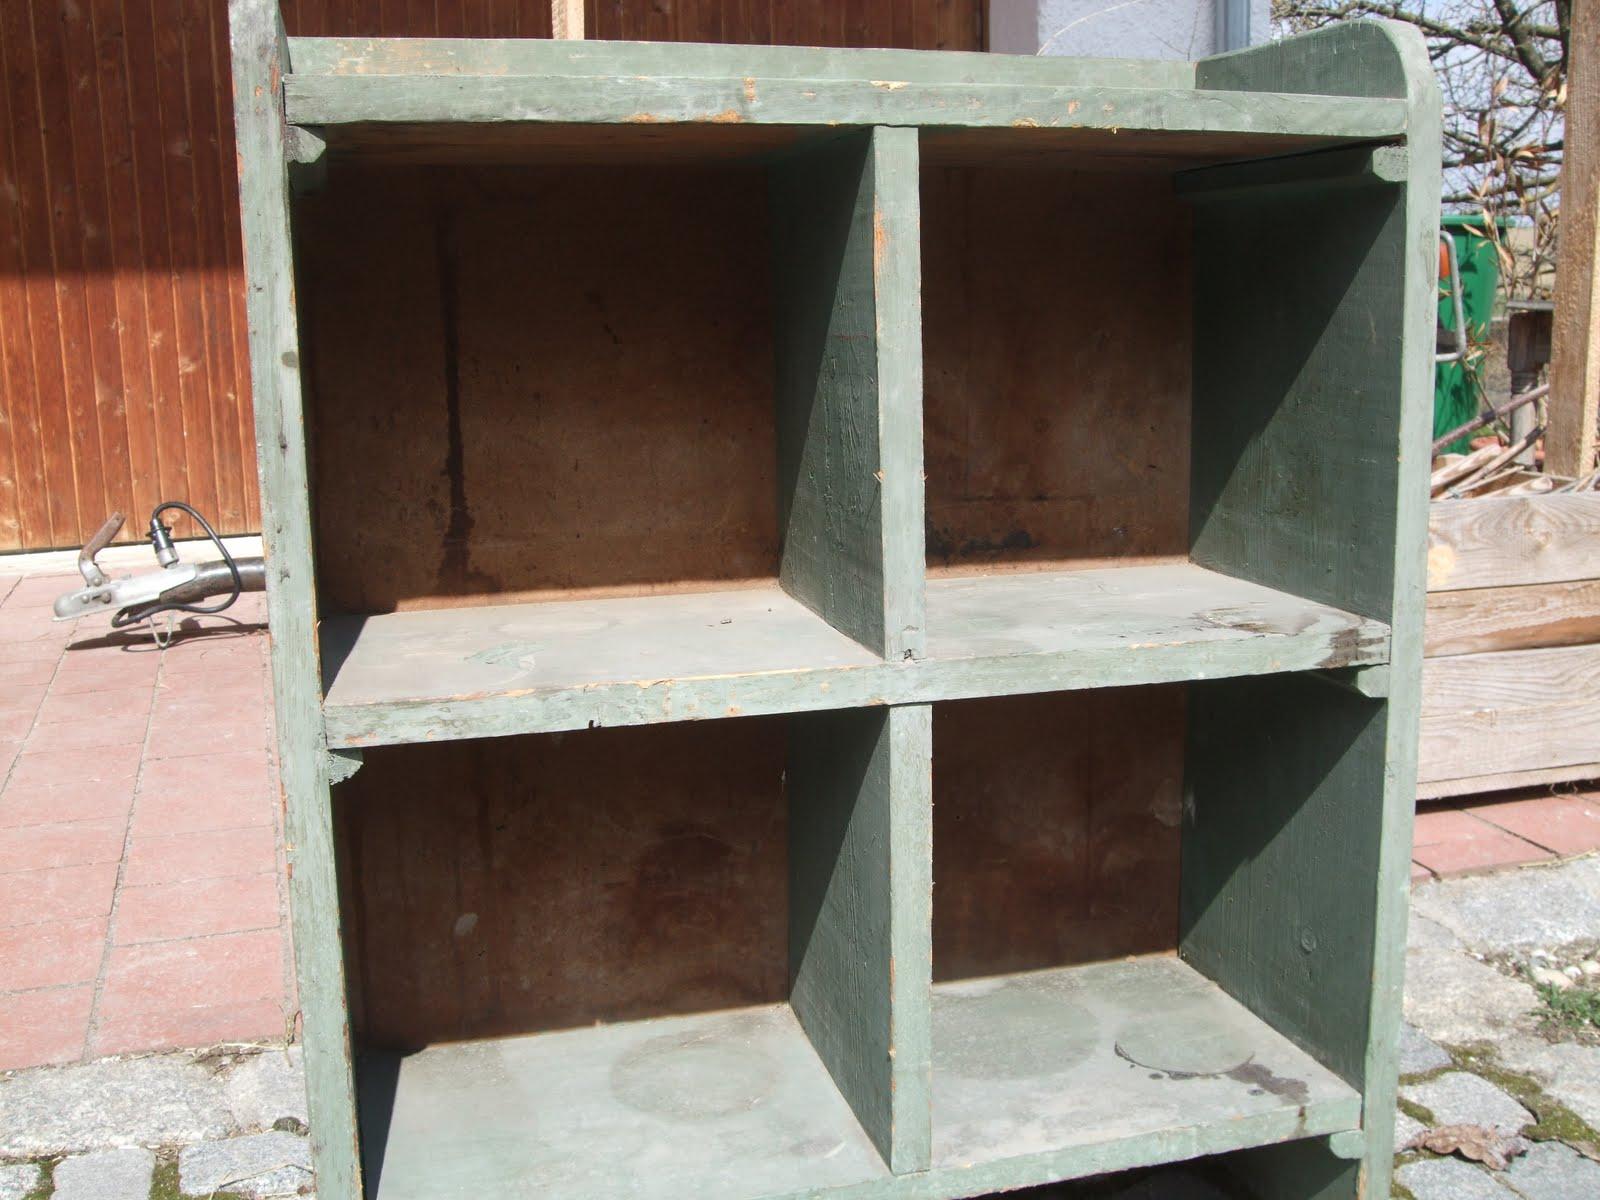 werkstatt regal perfect billig garage regale selber bauen. Black Bedroom Furniture Sets. Home Design Ideas